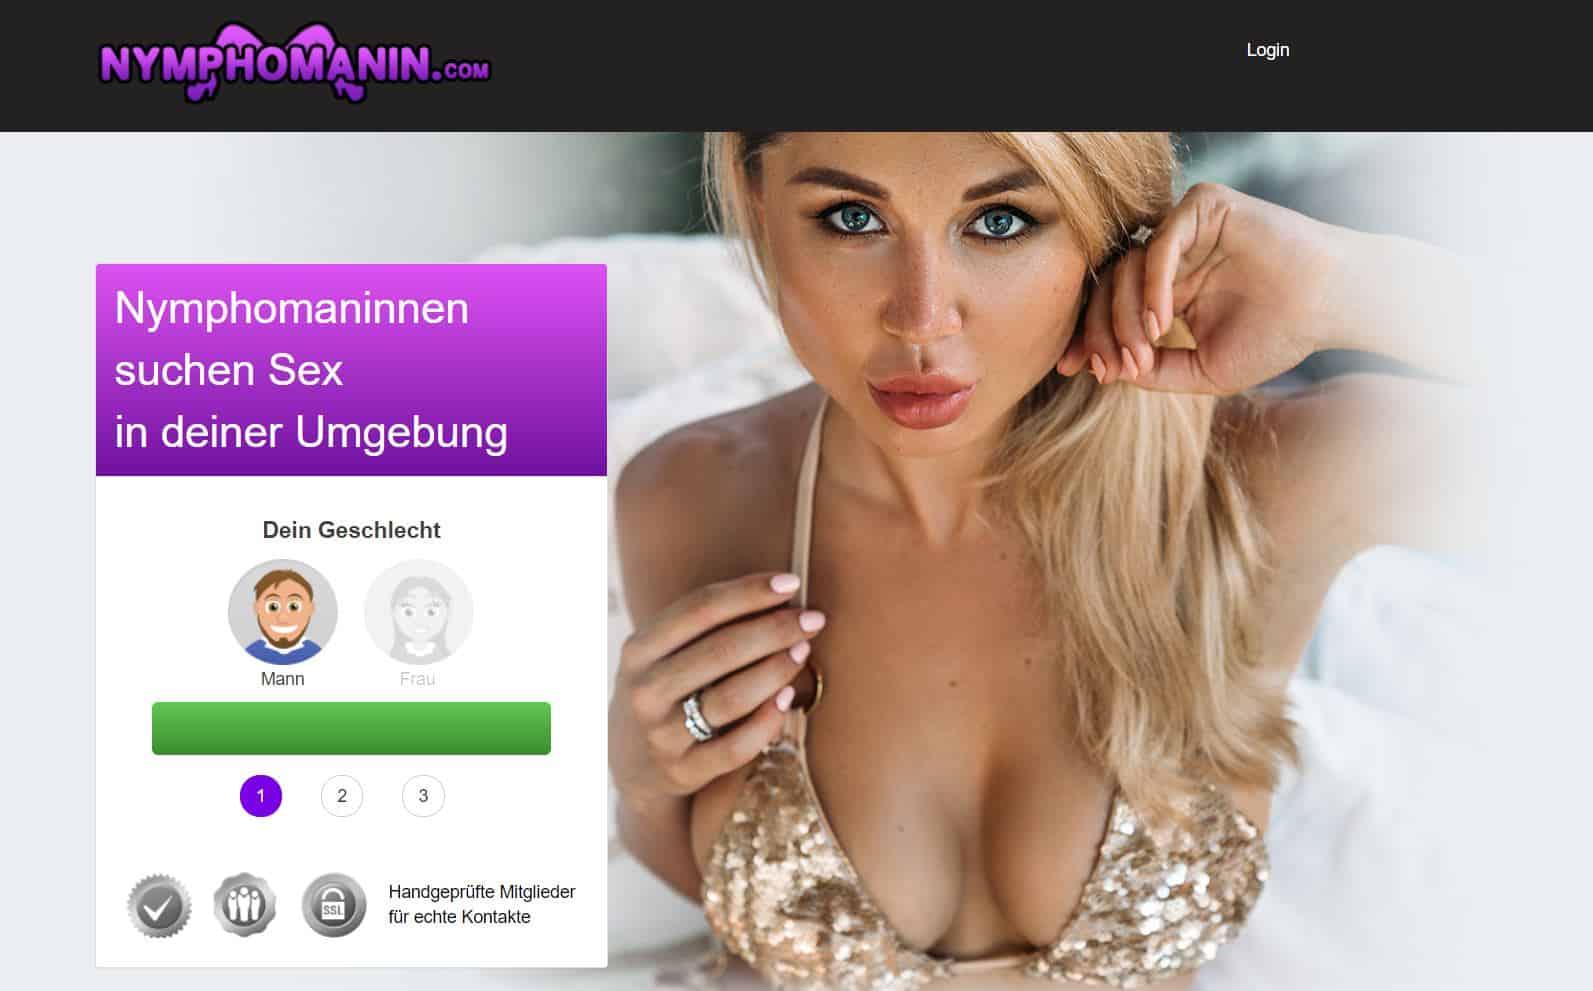 Testbericht: Nymphomanin.com Abzocke